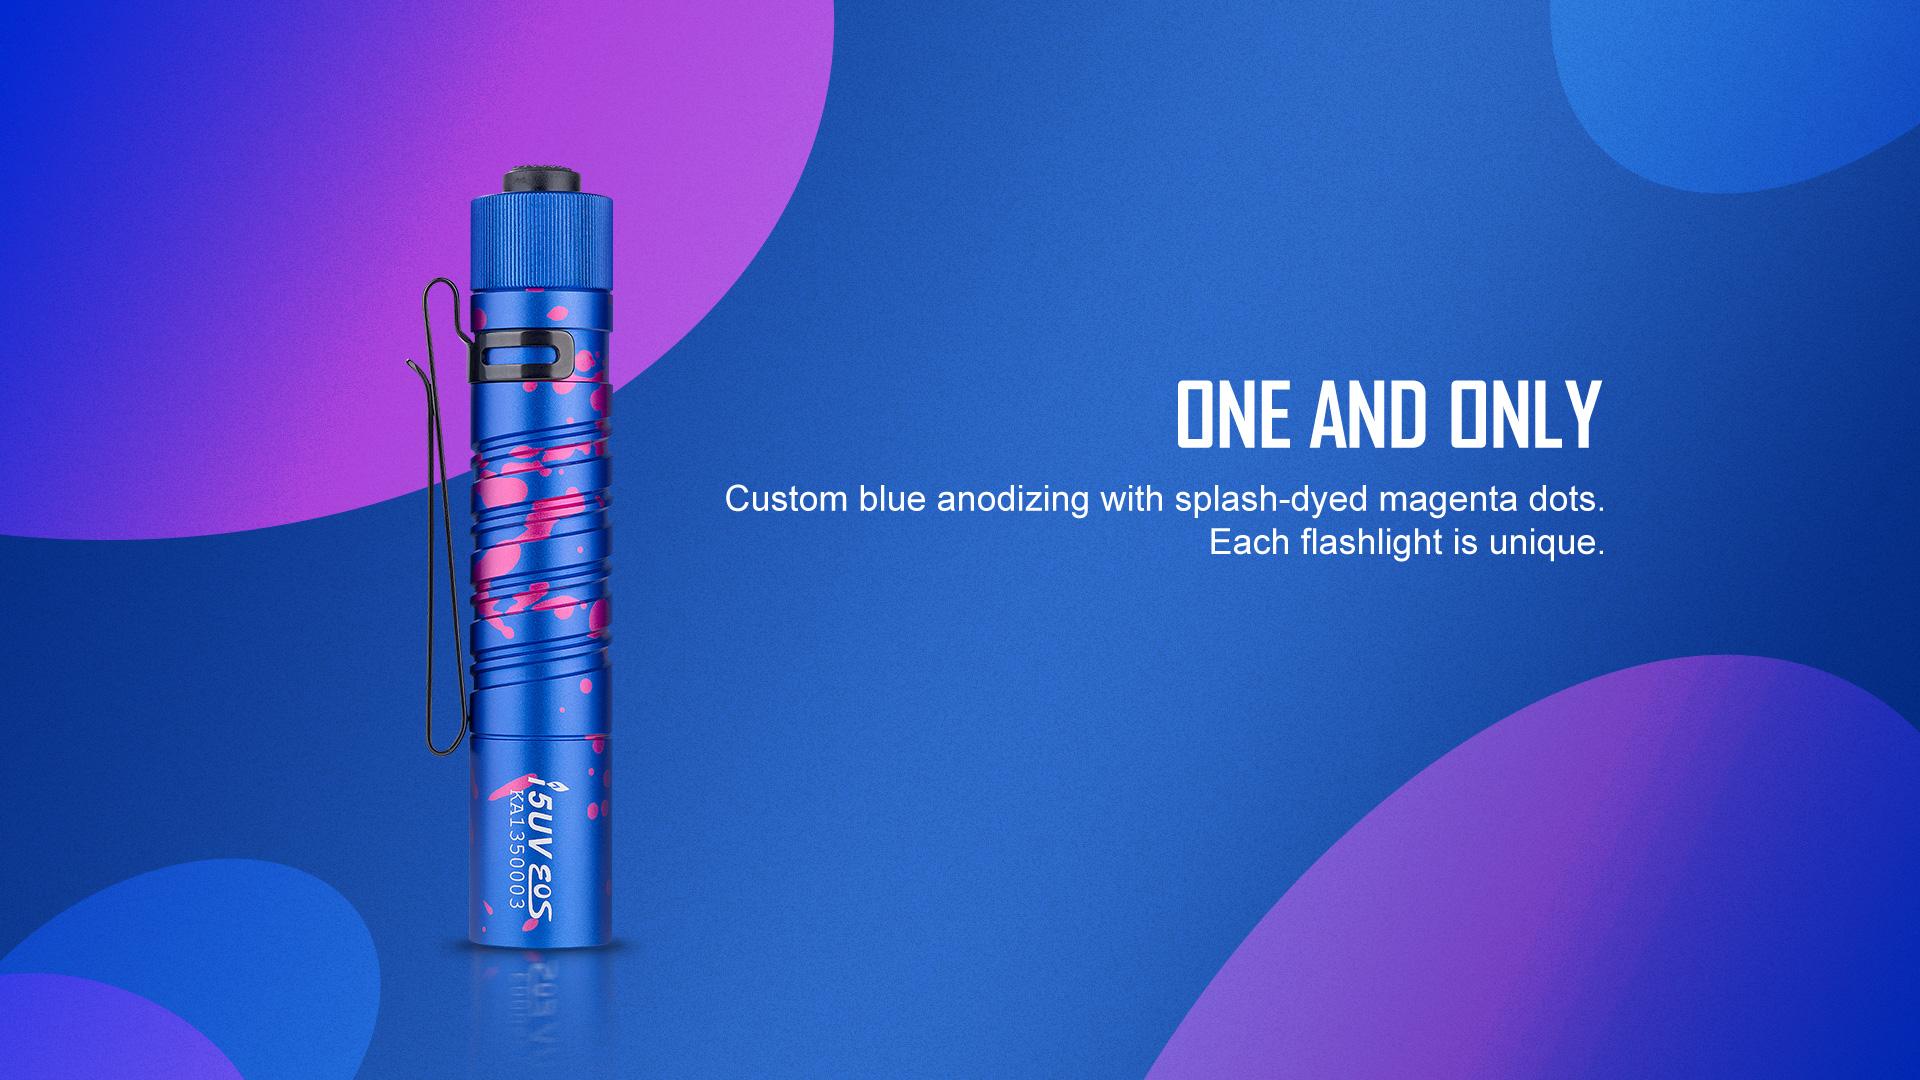 Olight i5 UV EOS Ultraviolet Flashlight Amazing Color